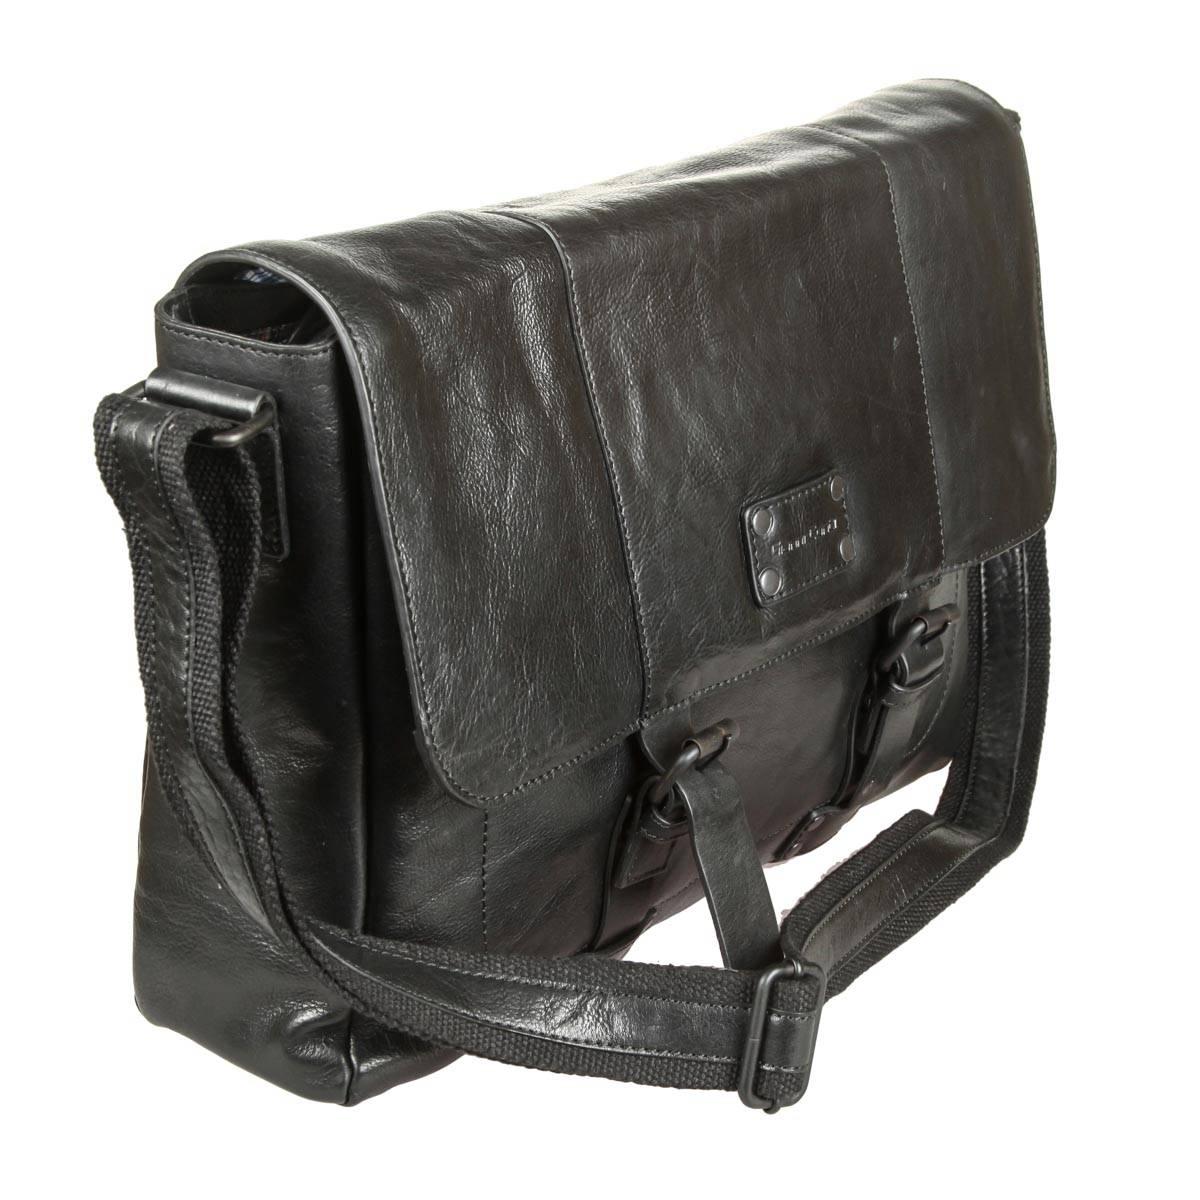 бизнес-сумка для мужчин